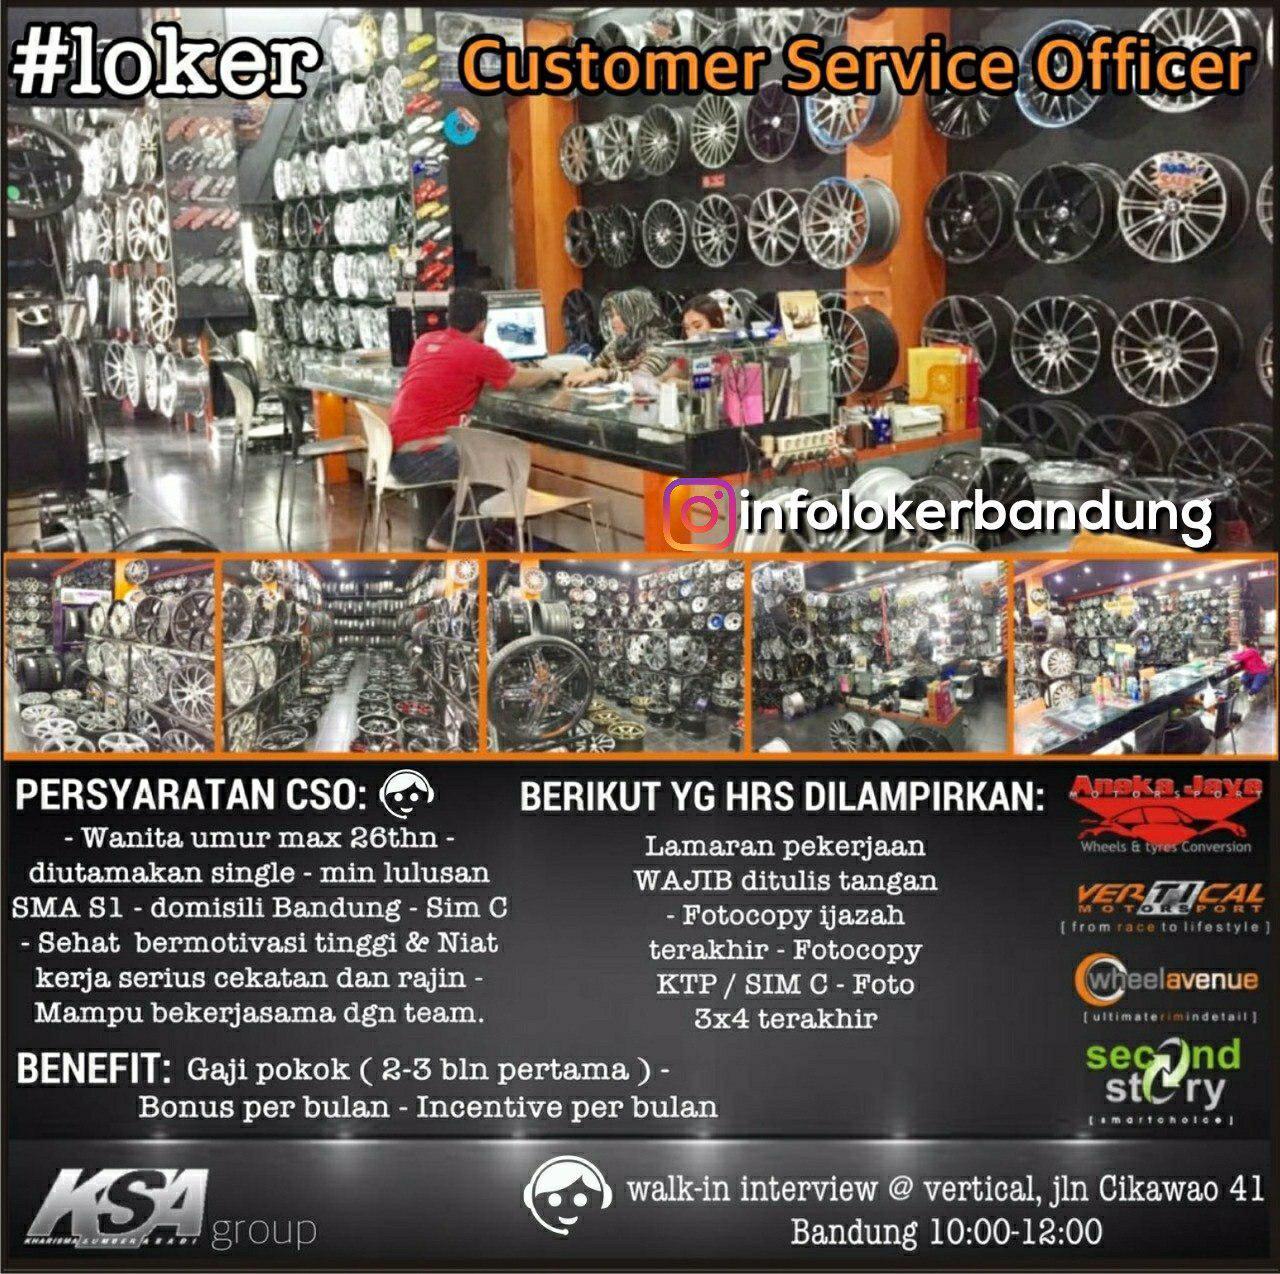 Lowongan Kerja Customer Service Officer Vertical Motorsport ( KSA Group) Bandung Juli 2018 - infolokerbandung.com